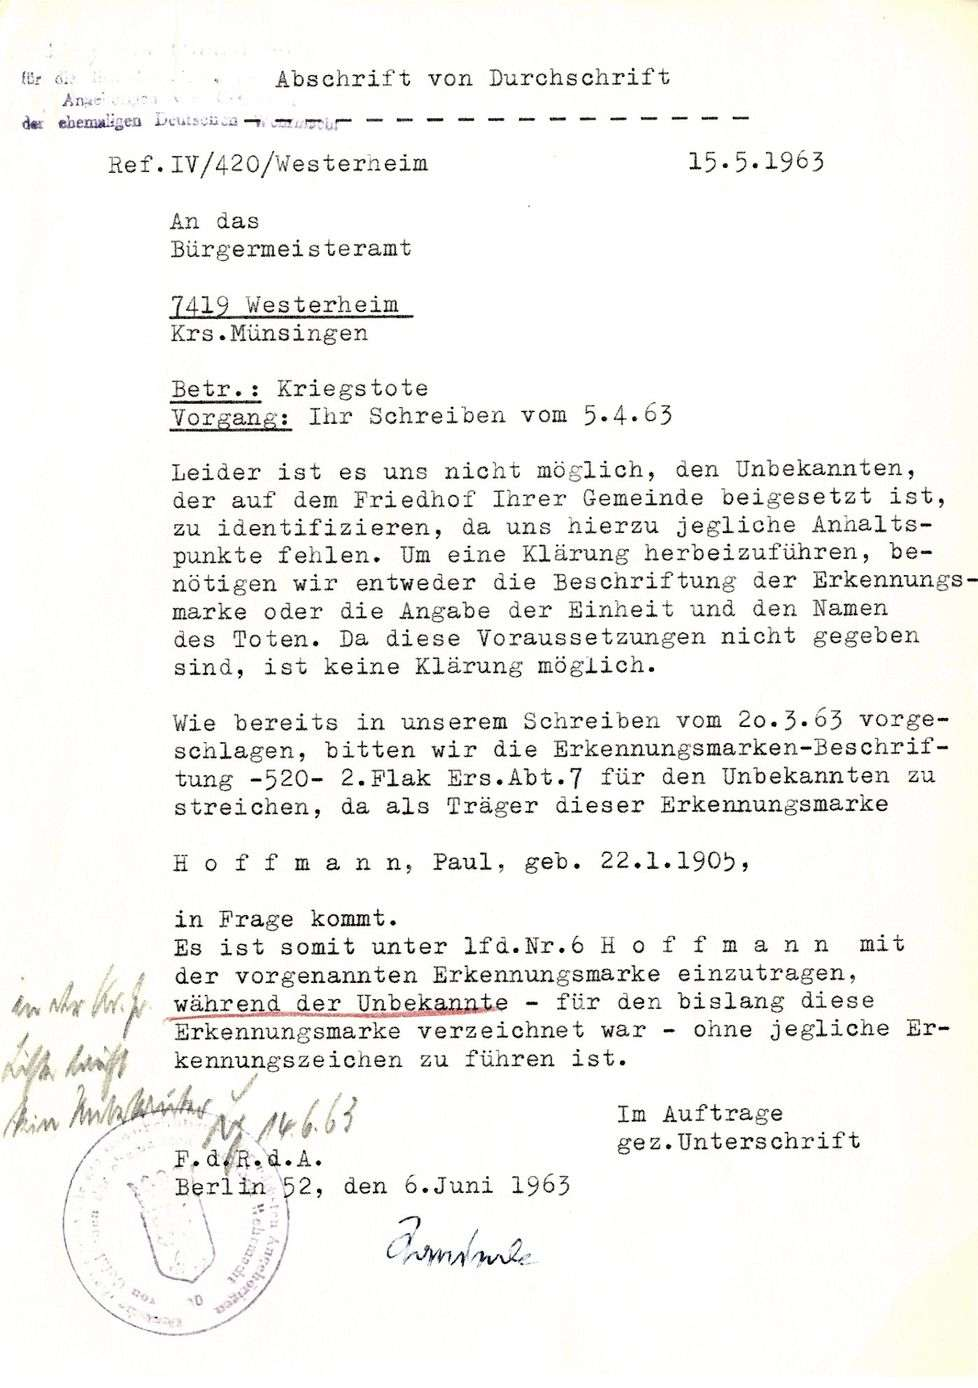 Westerheim, Bild 3